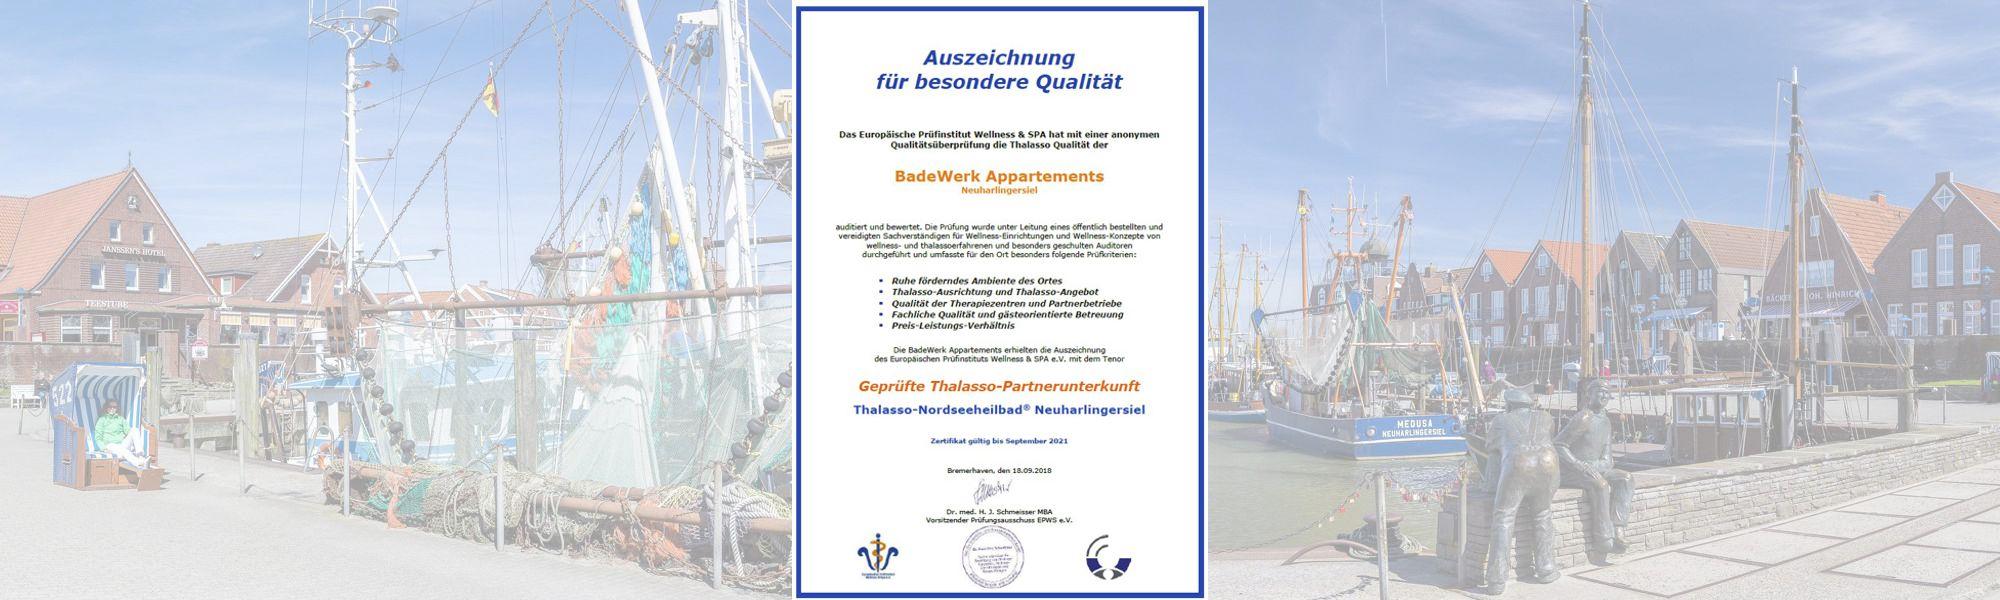 Geprüfte Thalasso-Partnerbetriebe in Neuharlingersiel